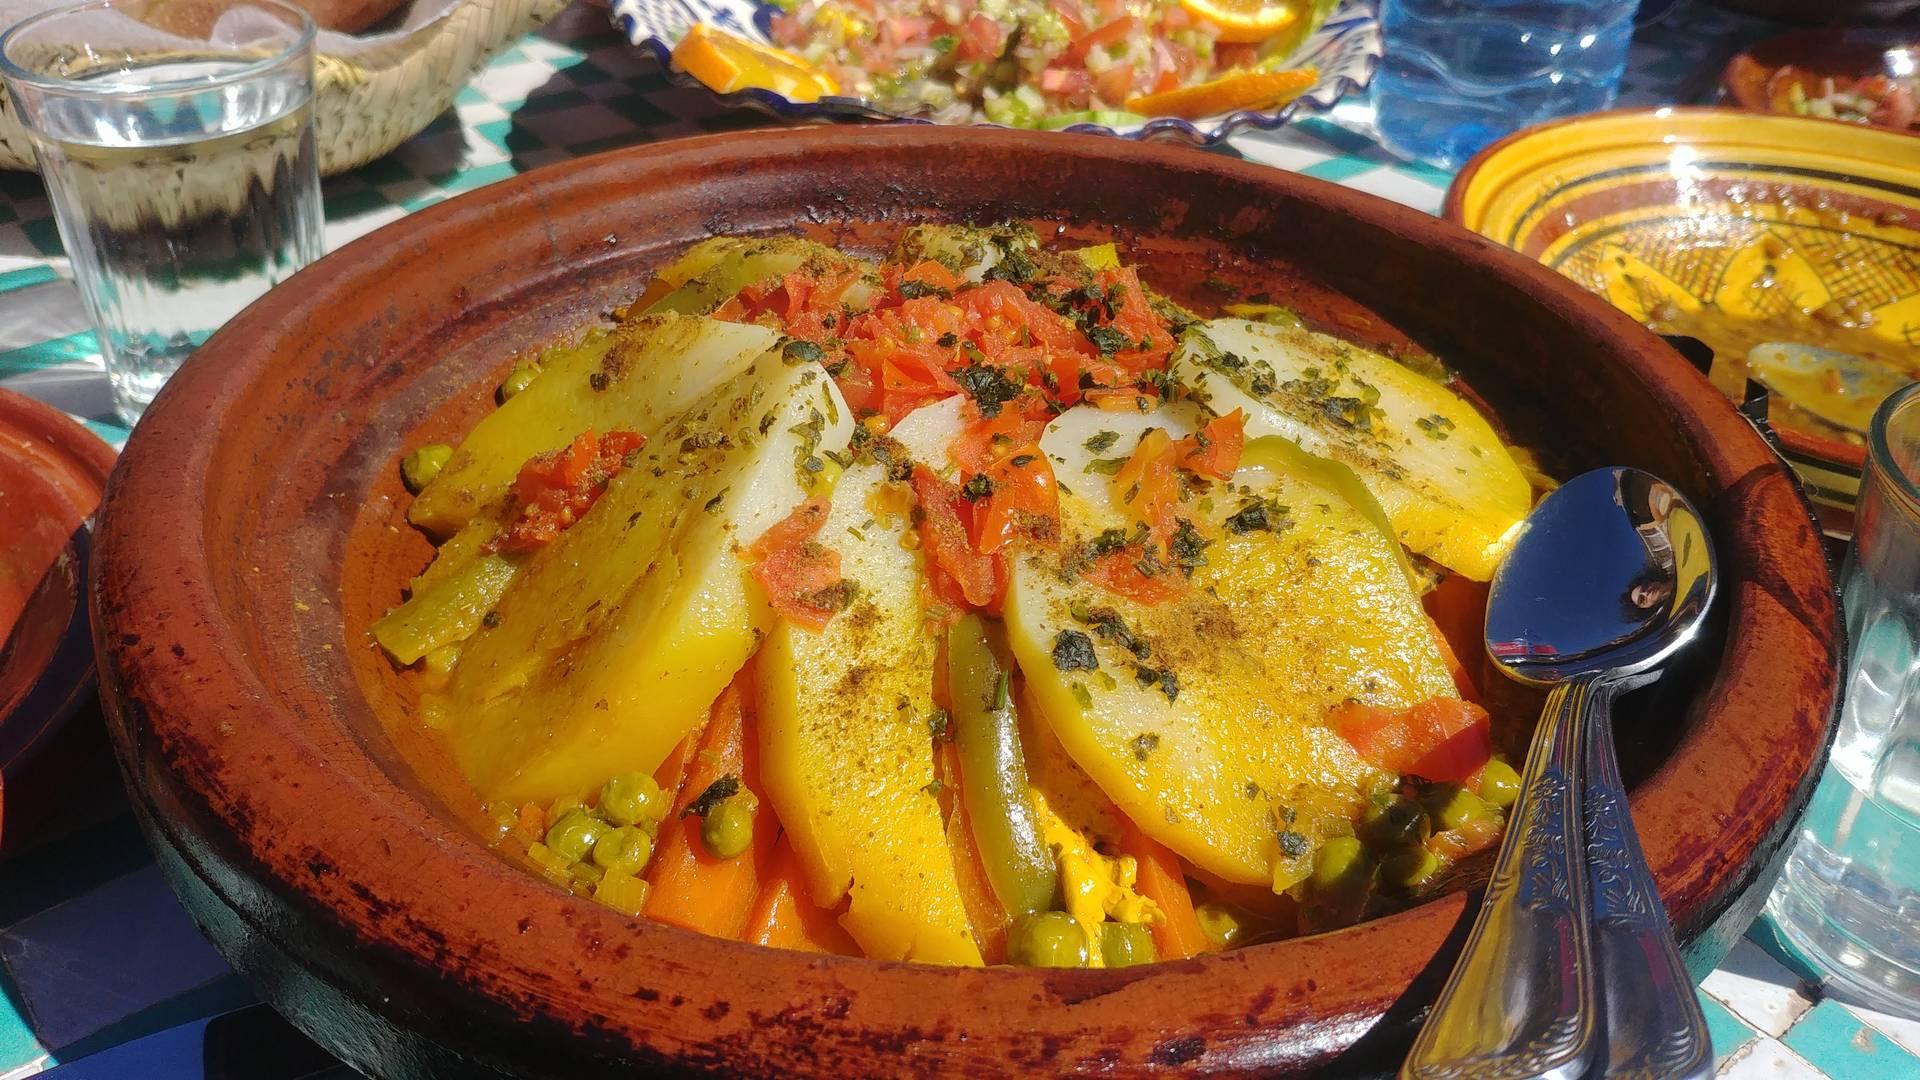 Maroc - Tajine de légumes dans la vallée d'Imlil